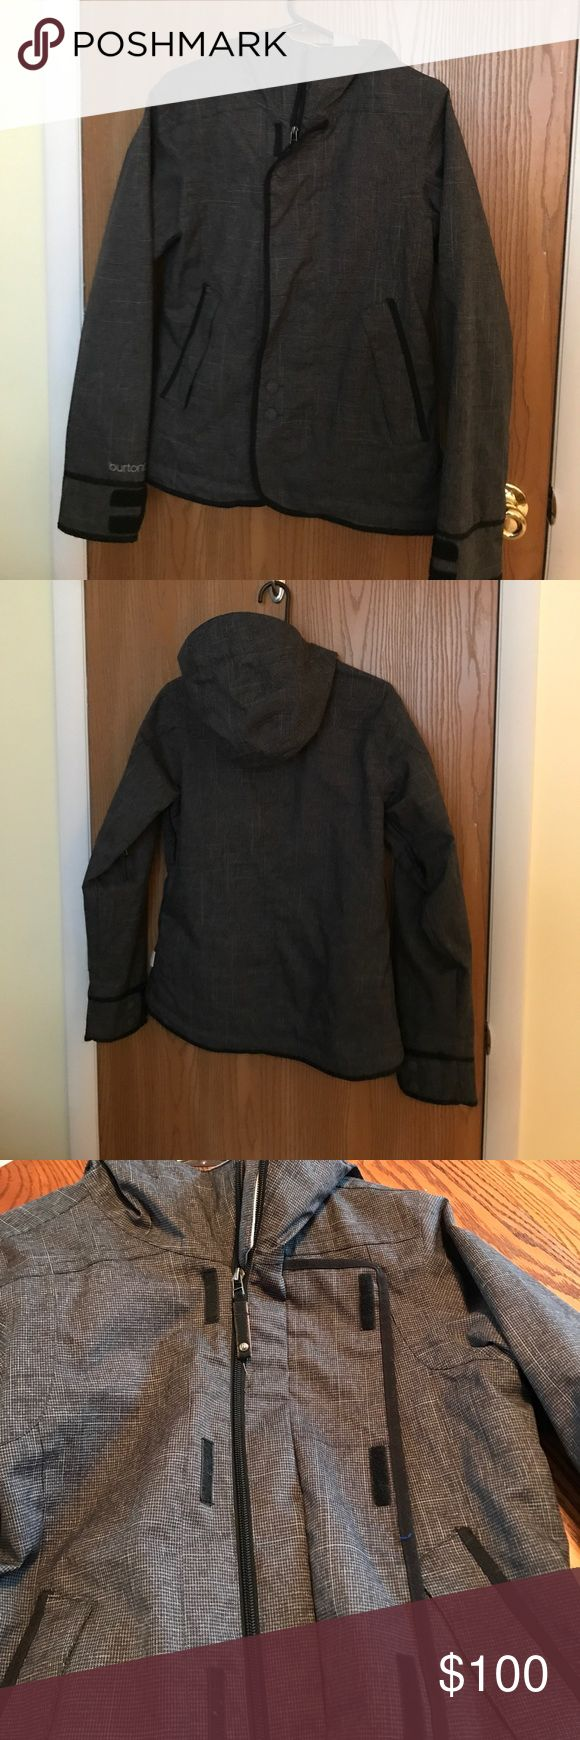 Burton Dryride ski jacket Charcoal and black, hooded Burton Ski jacket with zip and Velcro closure. Adjustable waist. Burton Jackets & Coats Utility Jackets